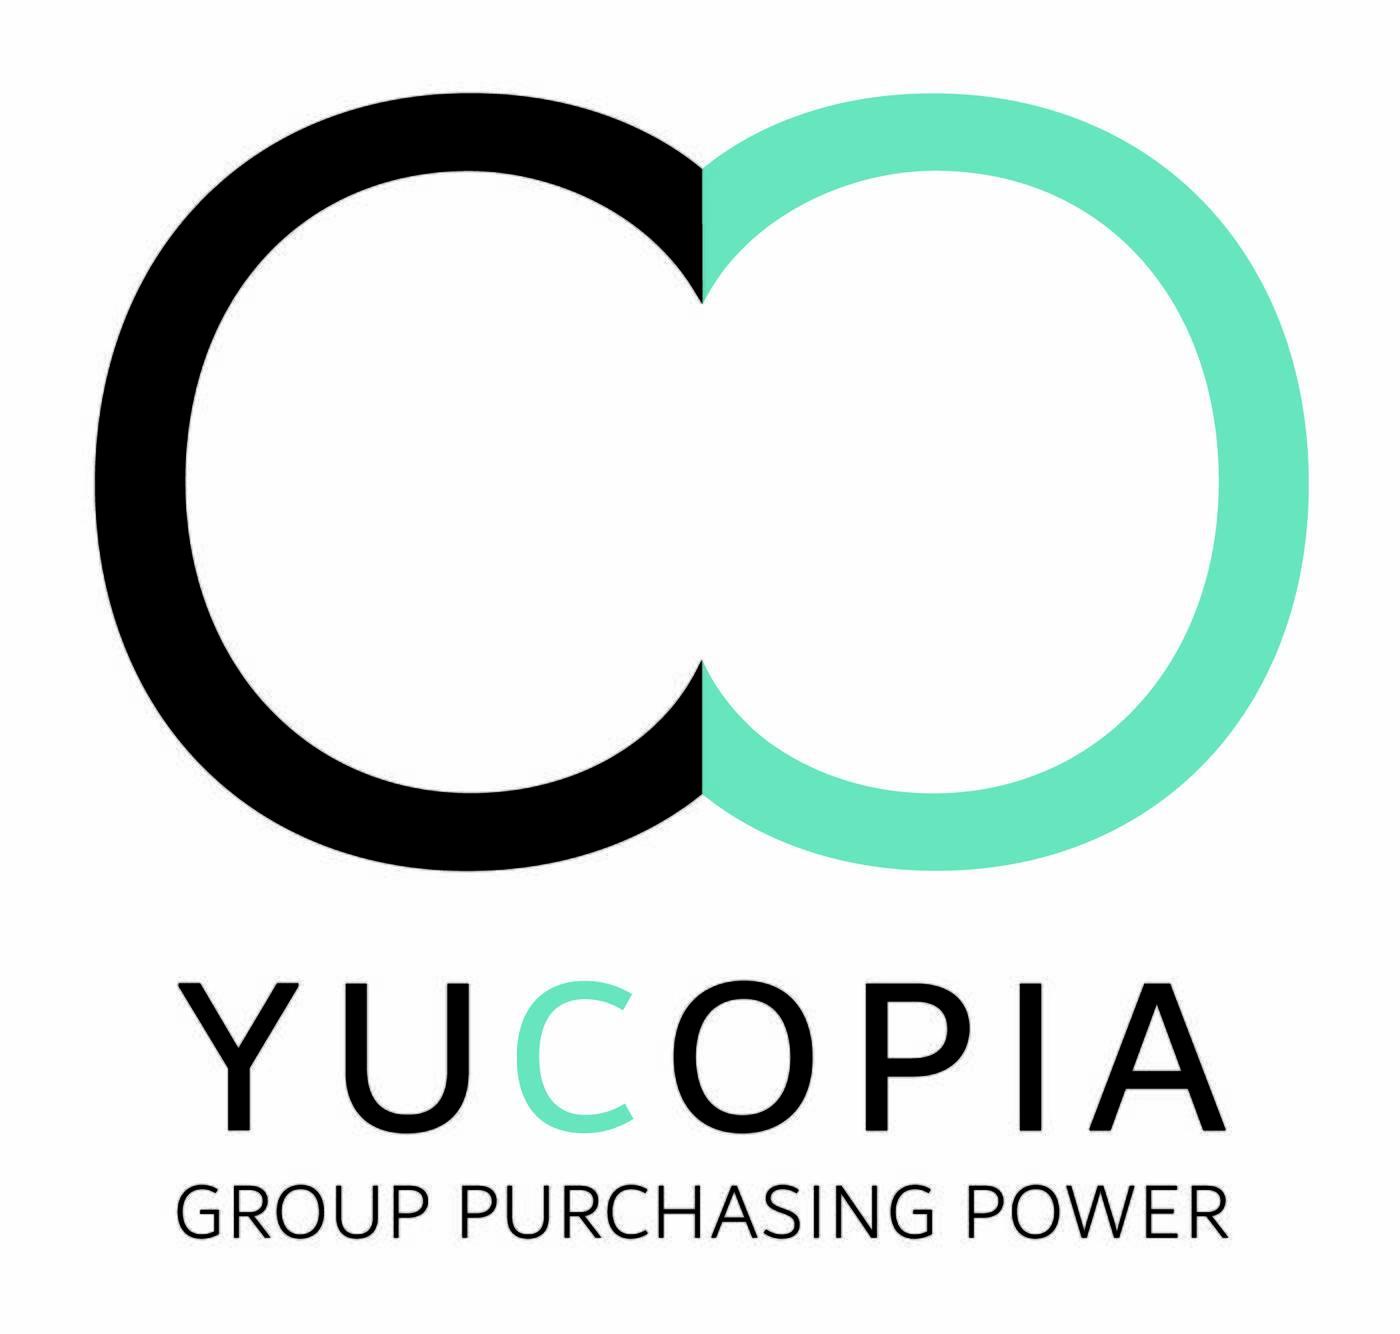 Yucopia